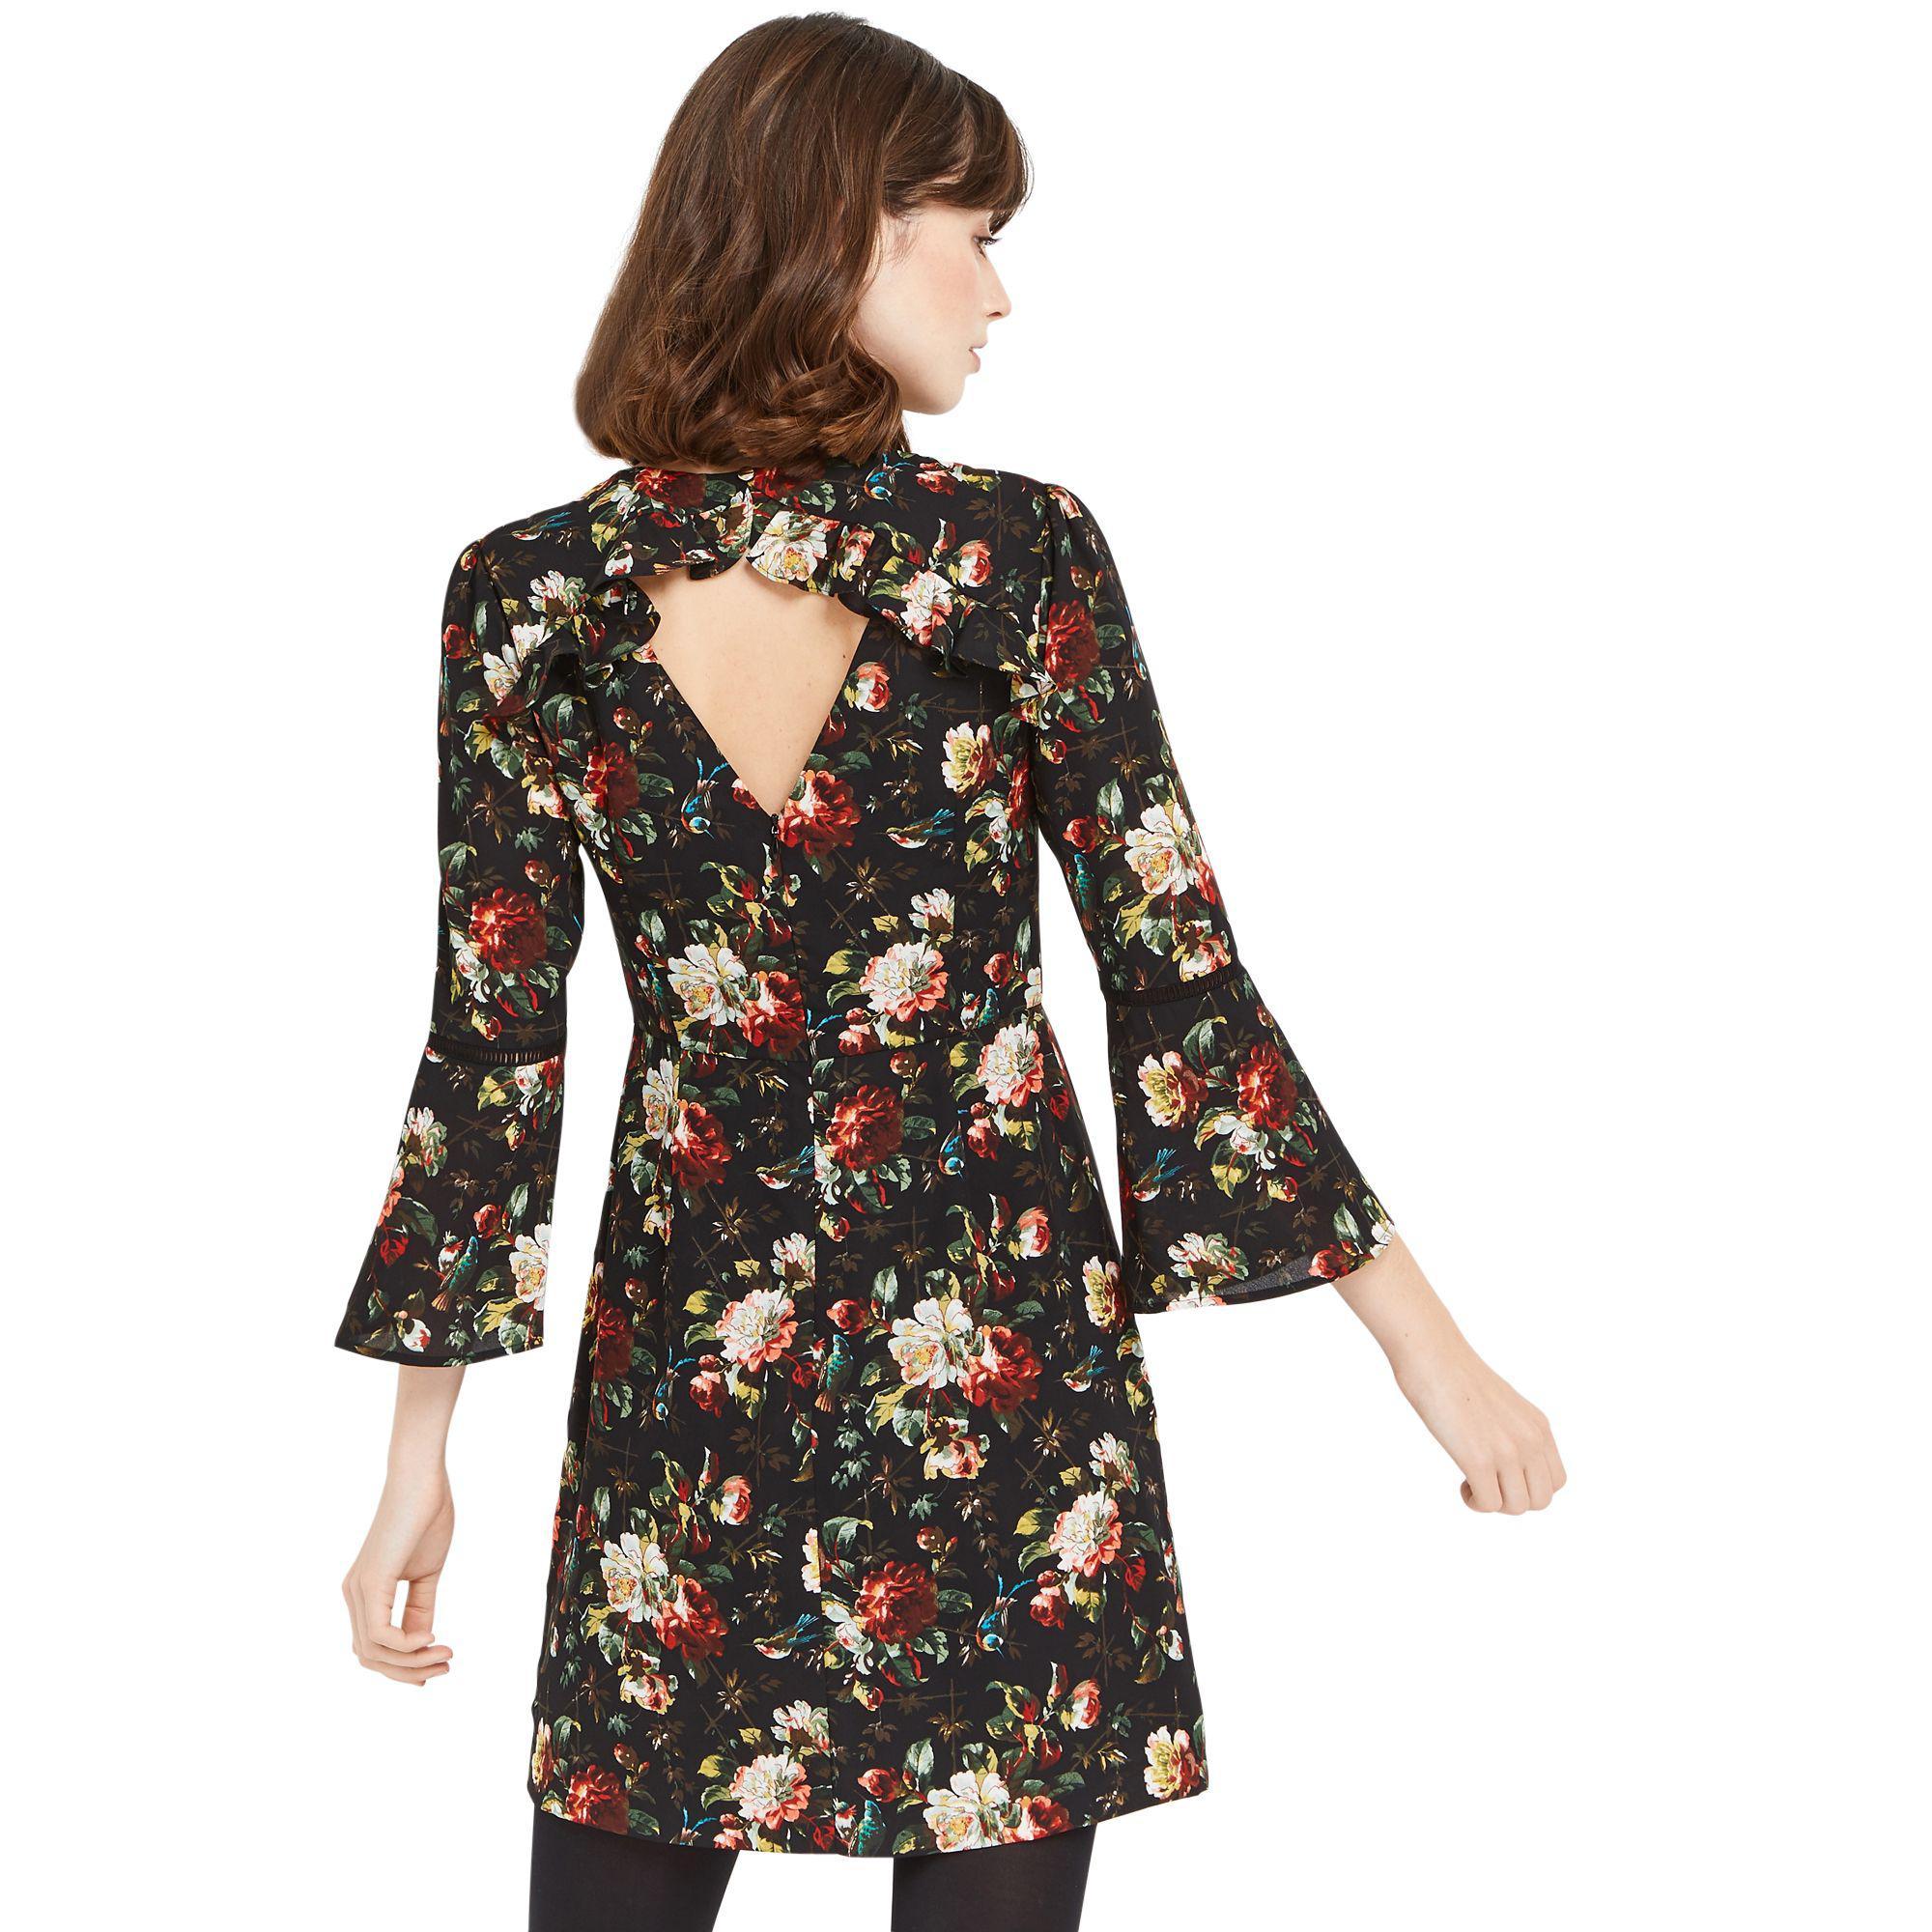 c461974e5807 Oasis Multi Coloured Floral Flute Sleeves Rose Shift Dress in Black ...